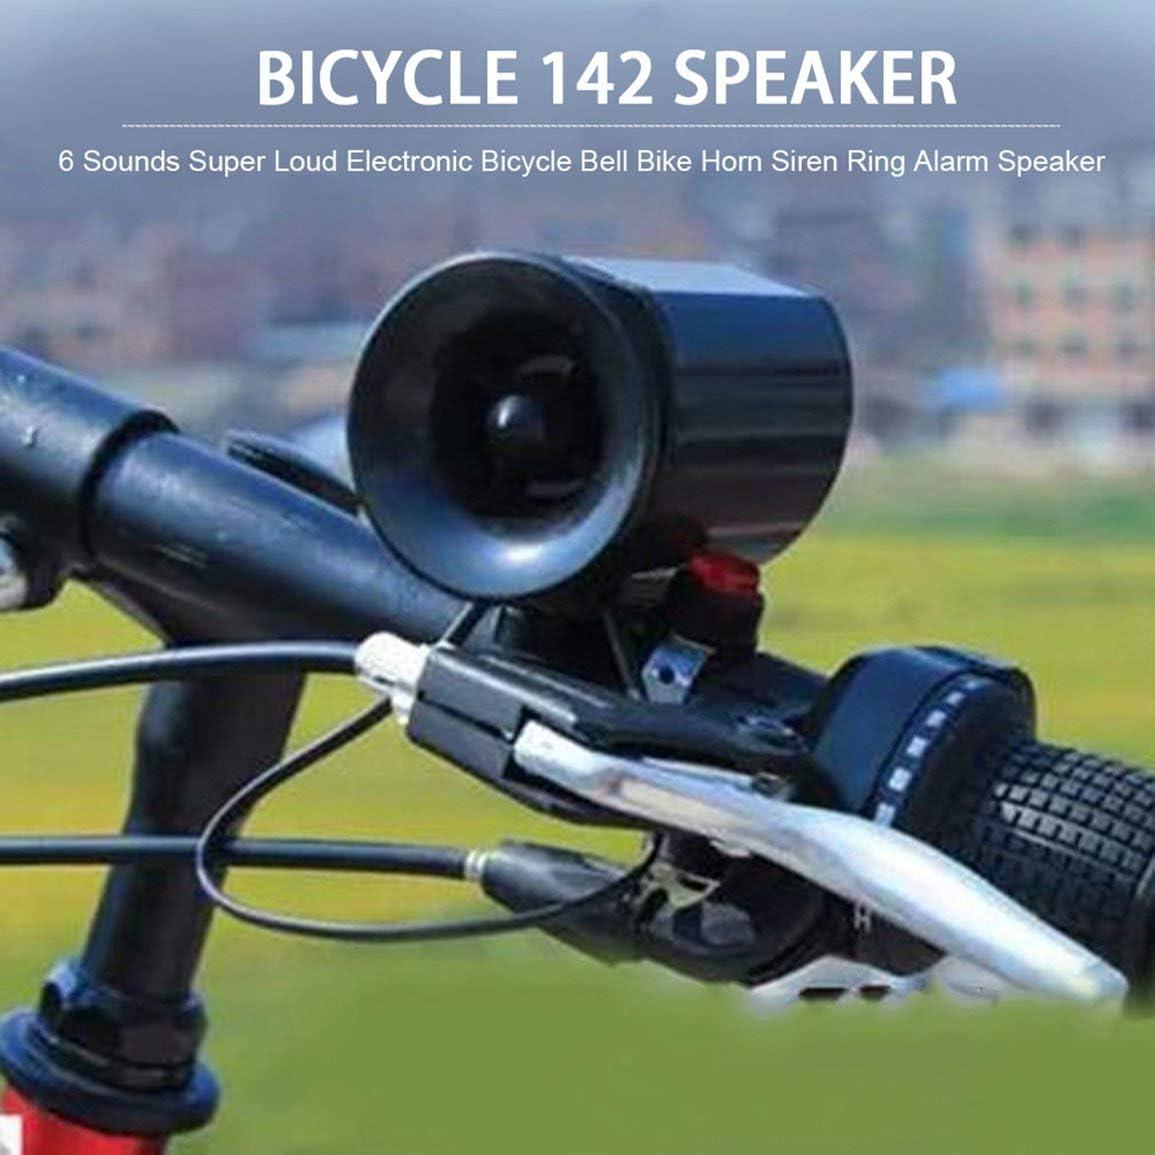 Garciadia 6 Wasserdichten super h/örbarer elektronisches Fahrrad Fahrradklingel Fahrrad-Lenker Horn Sirene Ring Alarm Lautsprecher Easy Sounds zu installieren Farbe: schwarz